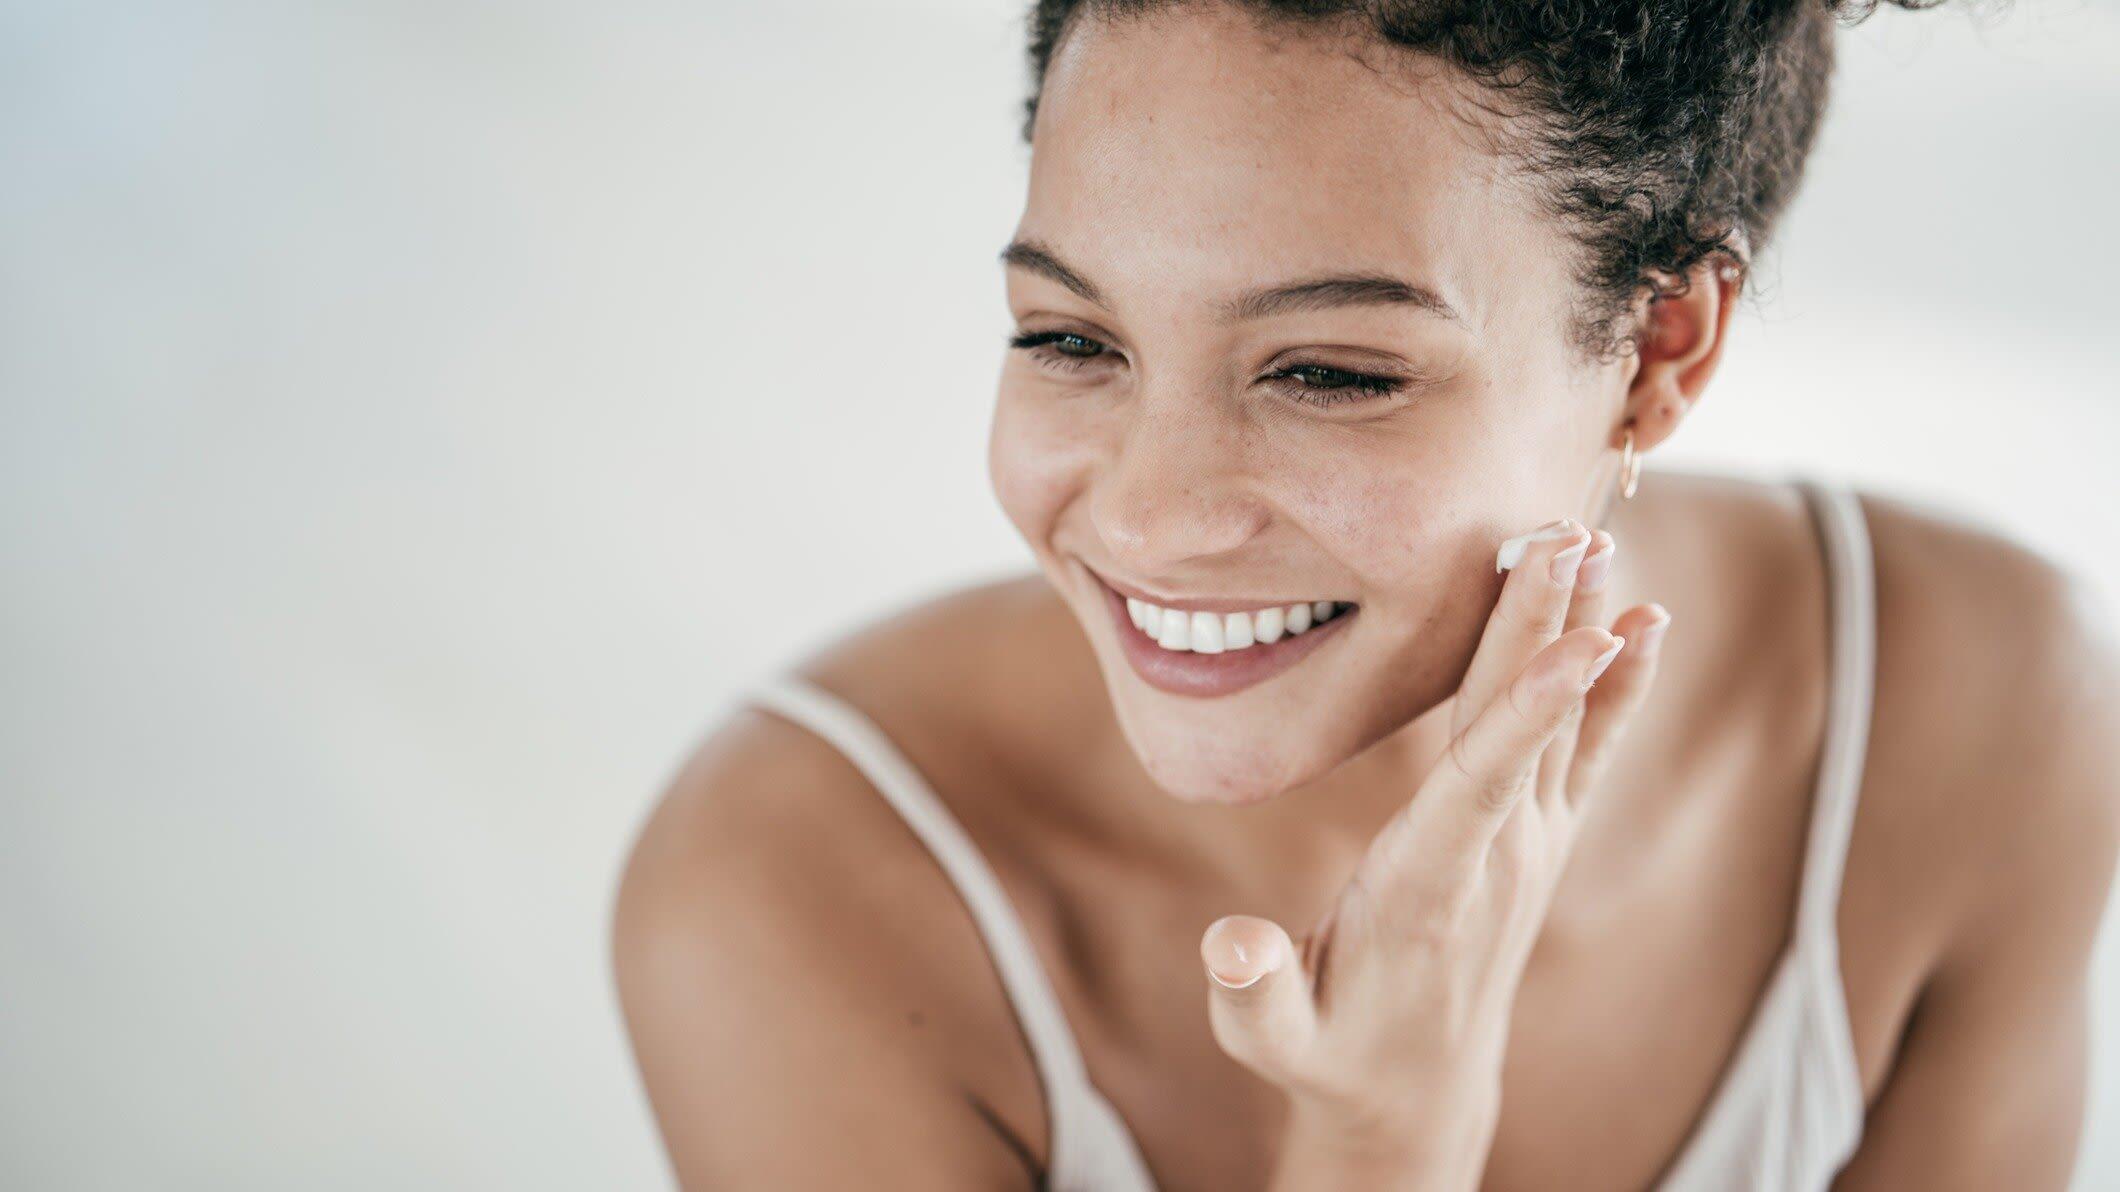 10 Bizarre Beauty Treatments You Won't Believe Actually Exist